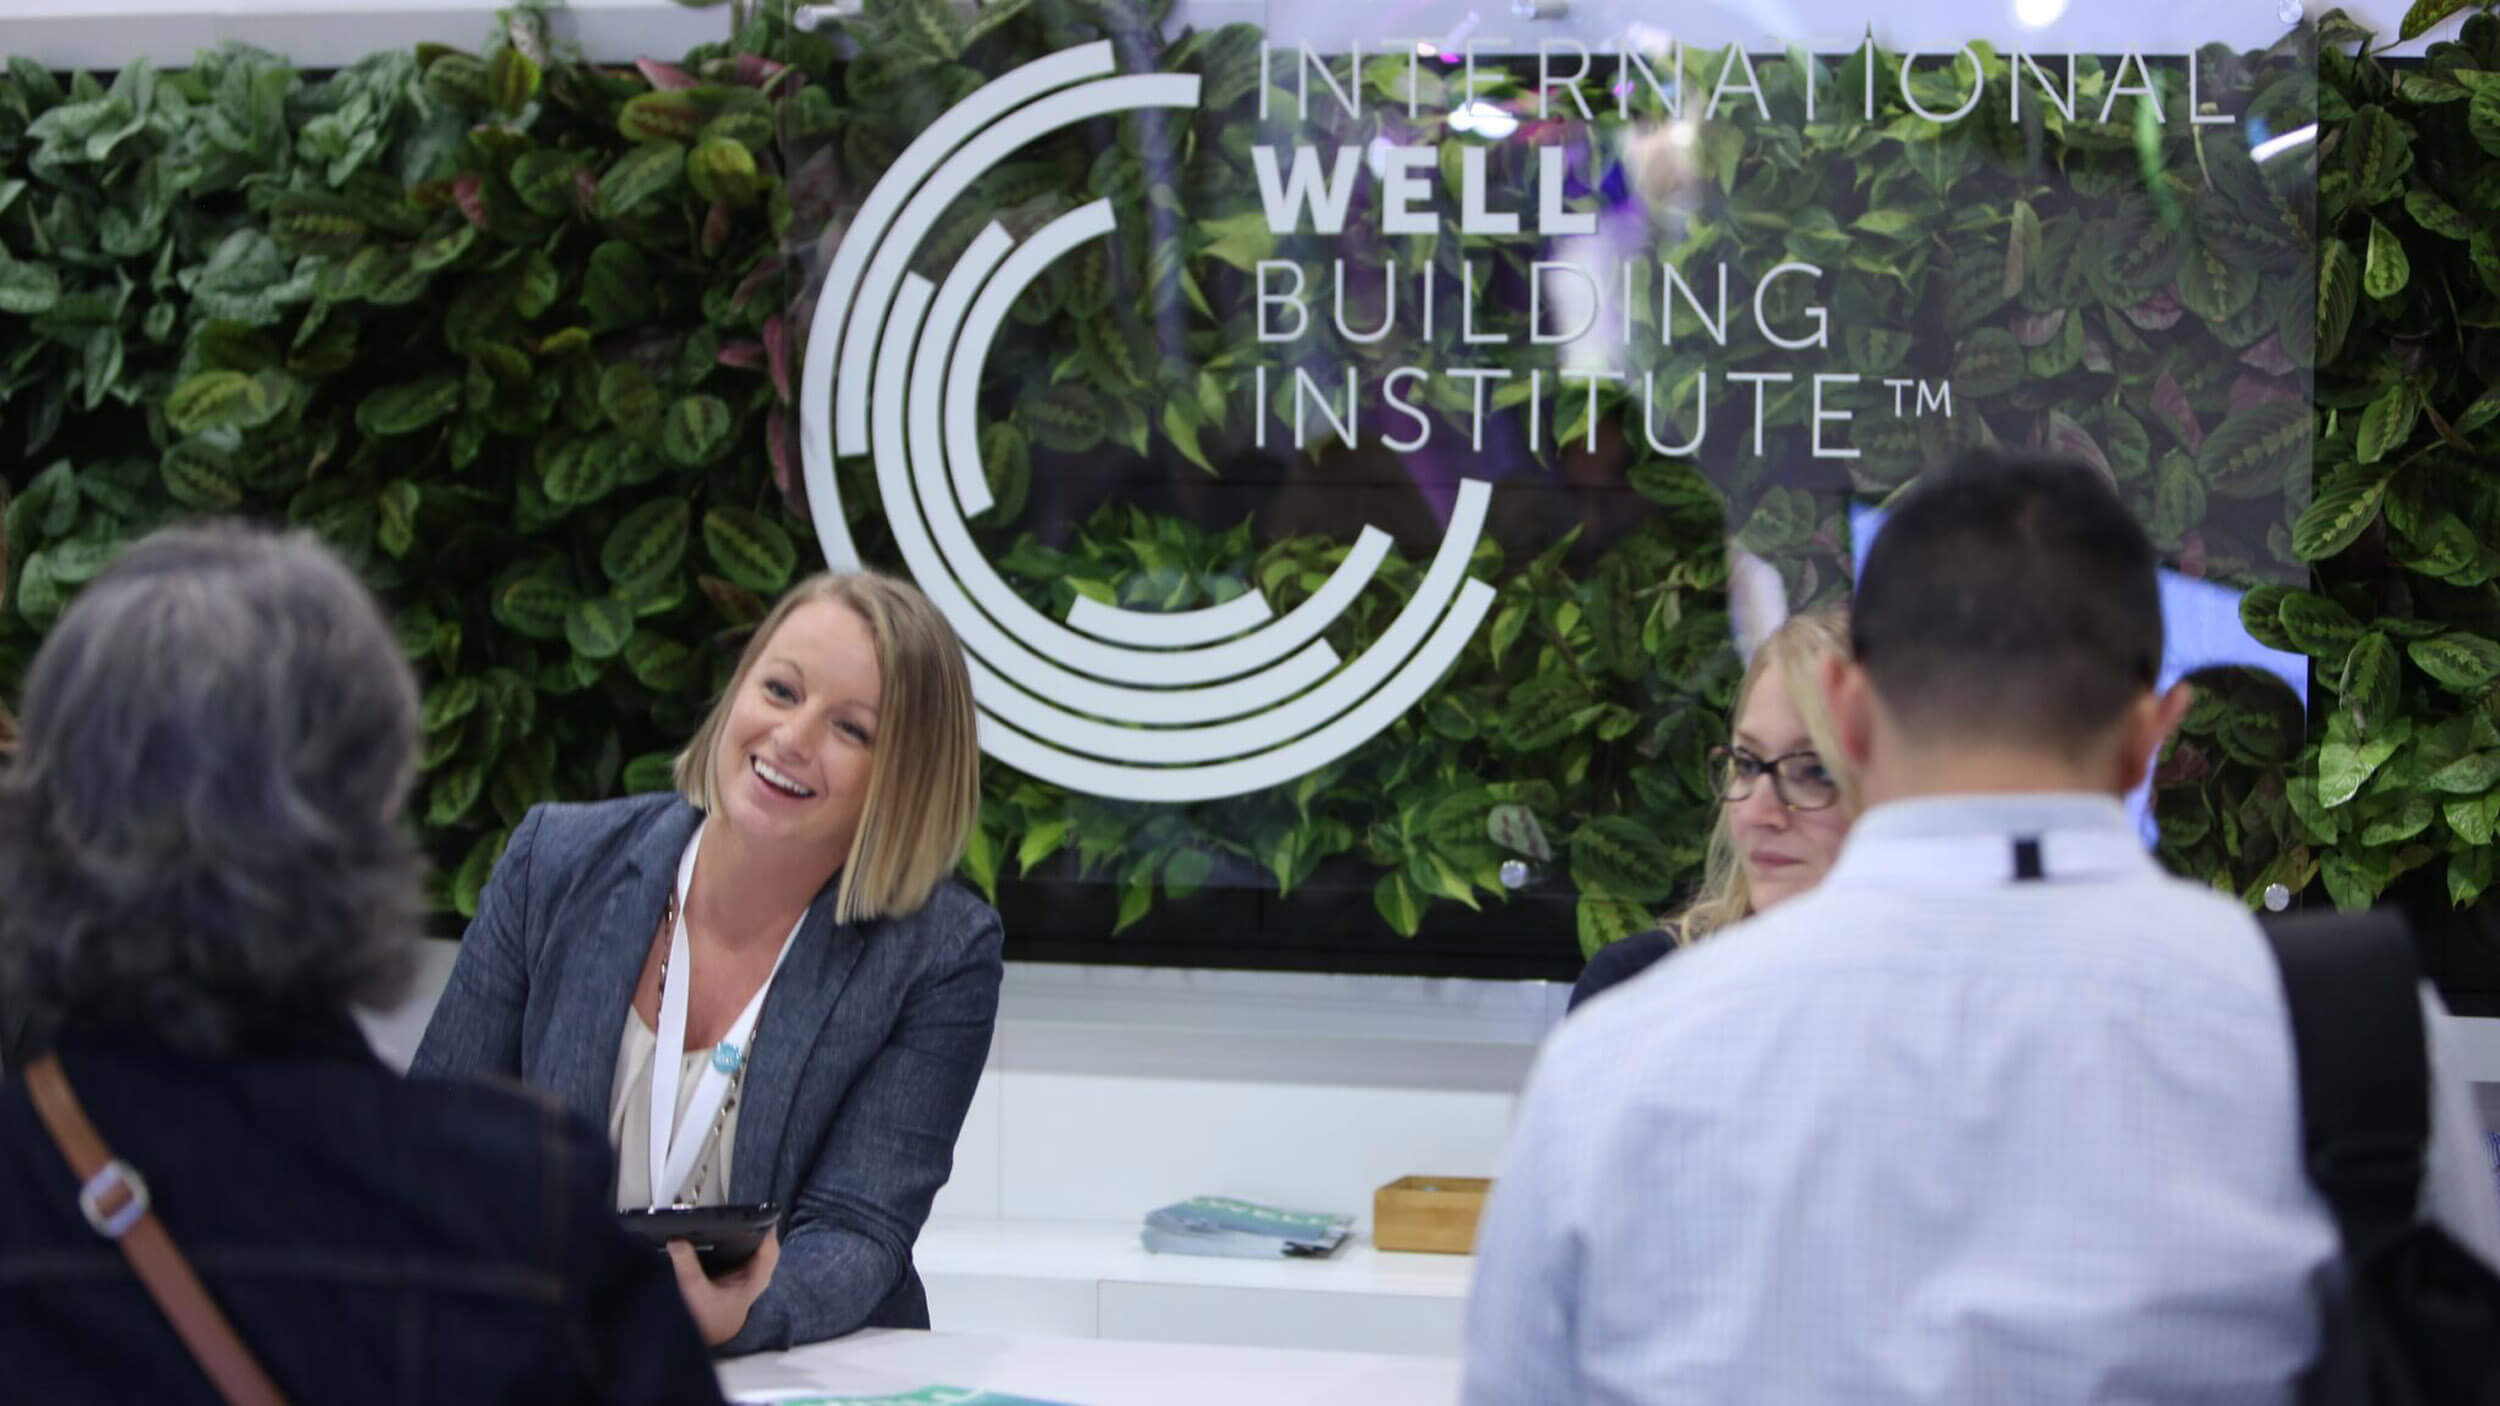 Greenbuild 2017 - Well Building Institute